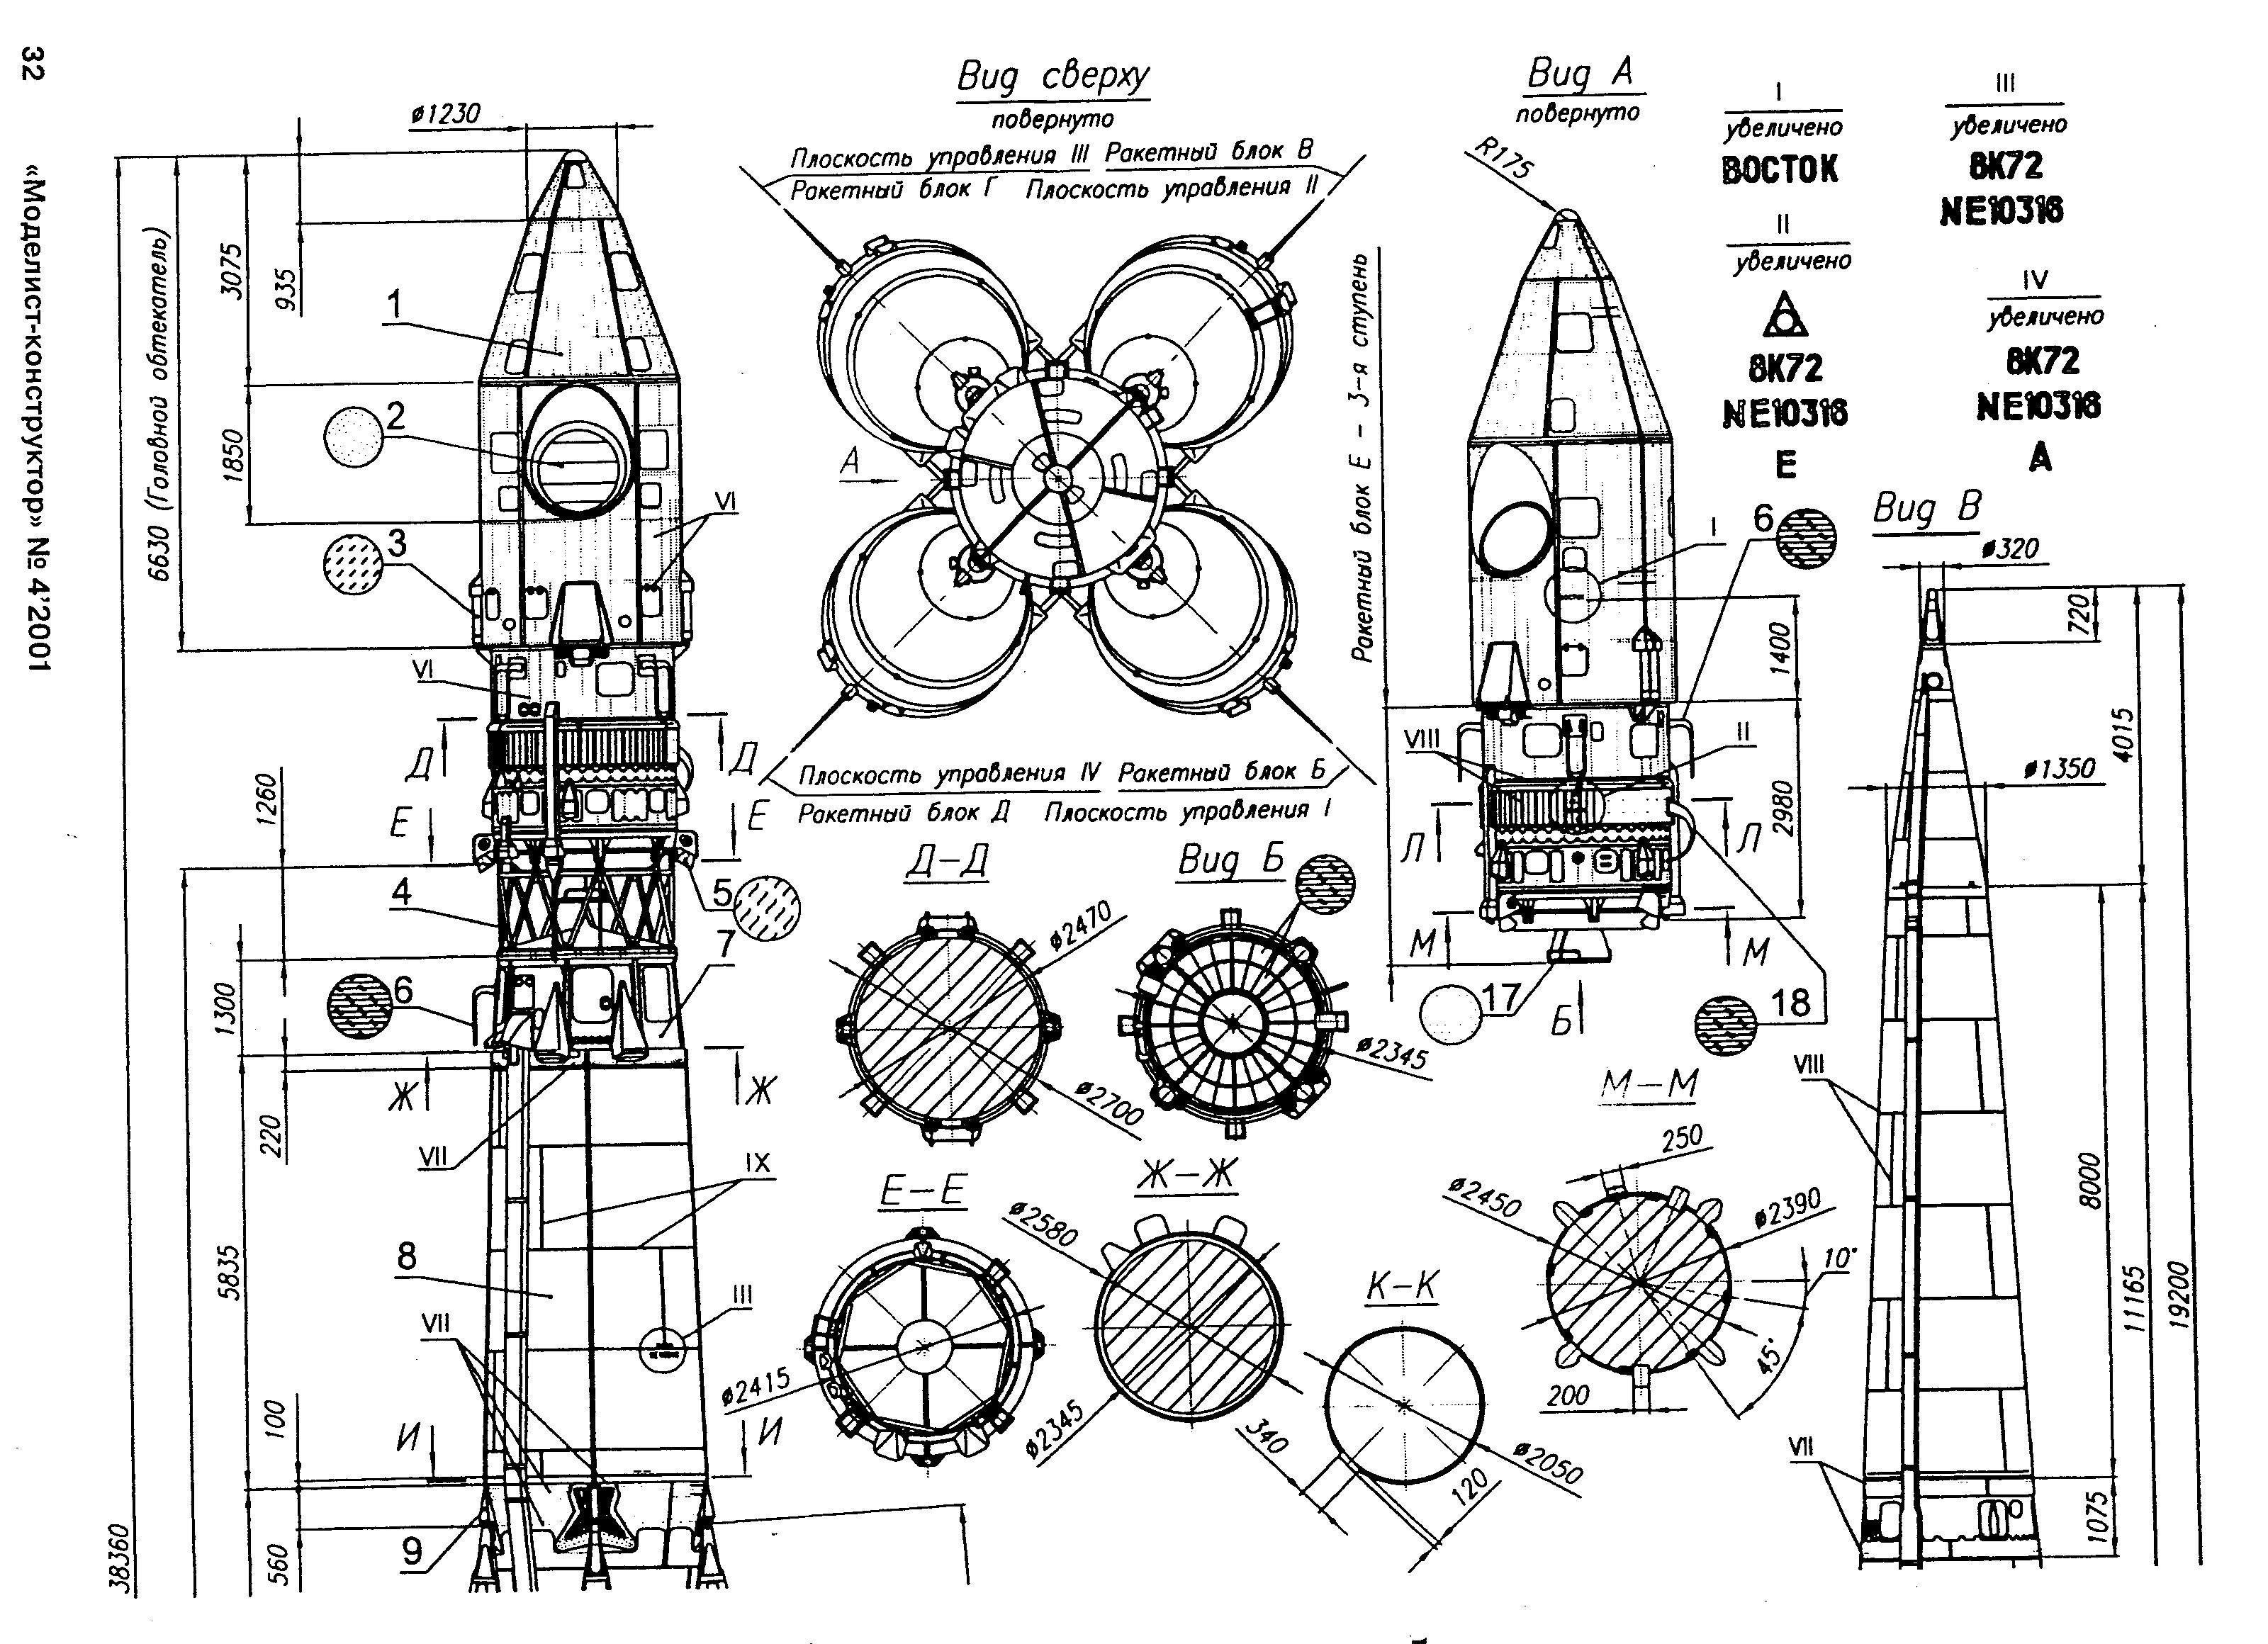 Soyuz Rocket Diagram